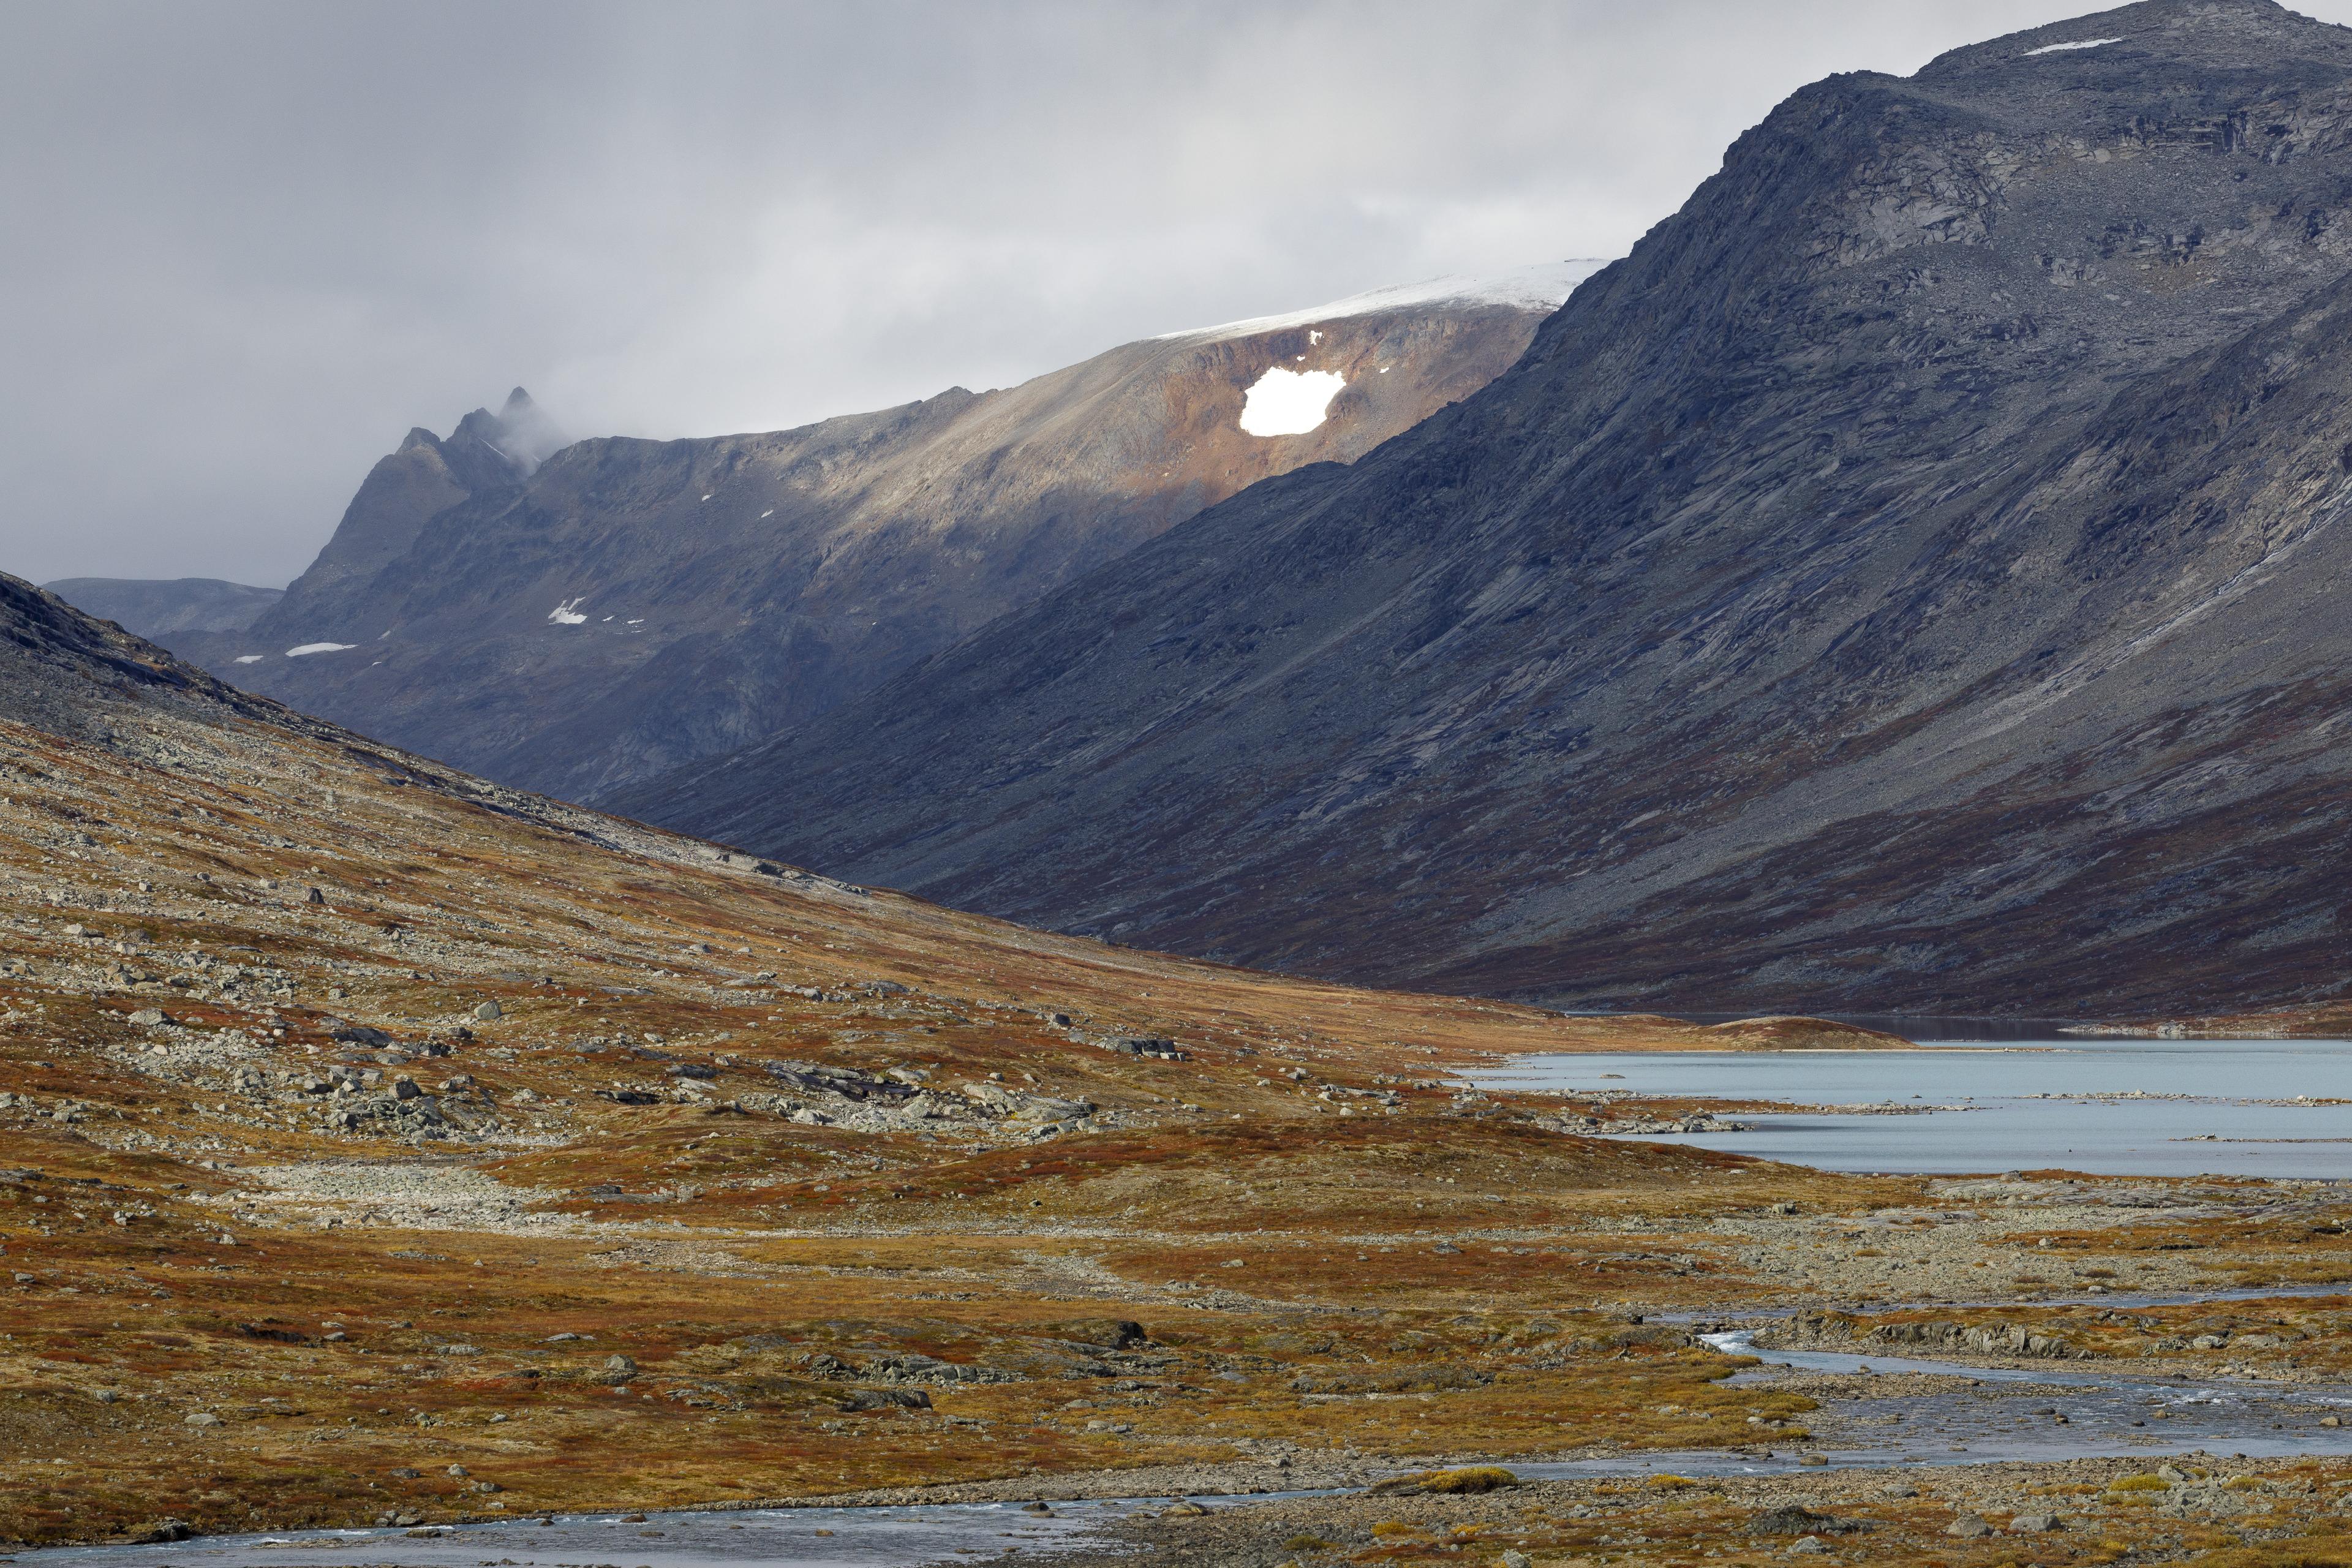 Blick zurück entlang des Sealggajohka, dahinter erhebt sich das Storsteinsfjellet,©Markus Proske—Canon EOS 5D Mark IV, EF70-300mm f/4-5.6L IS USM, 170mm, 1/320s, Blende 11, ISO 320